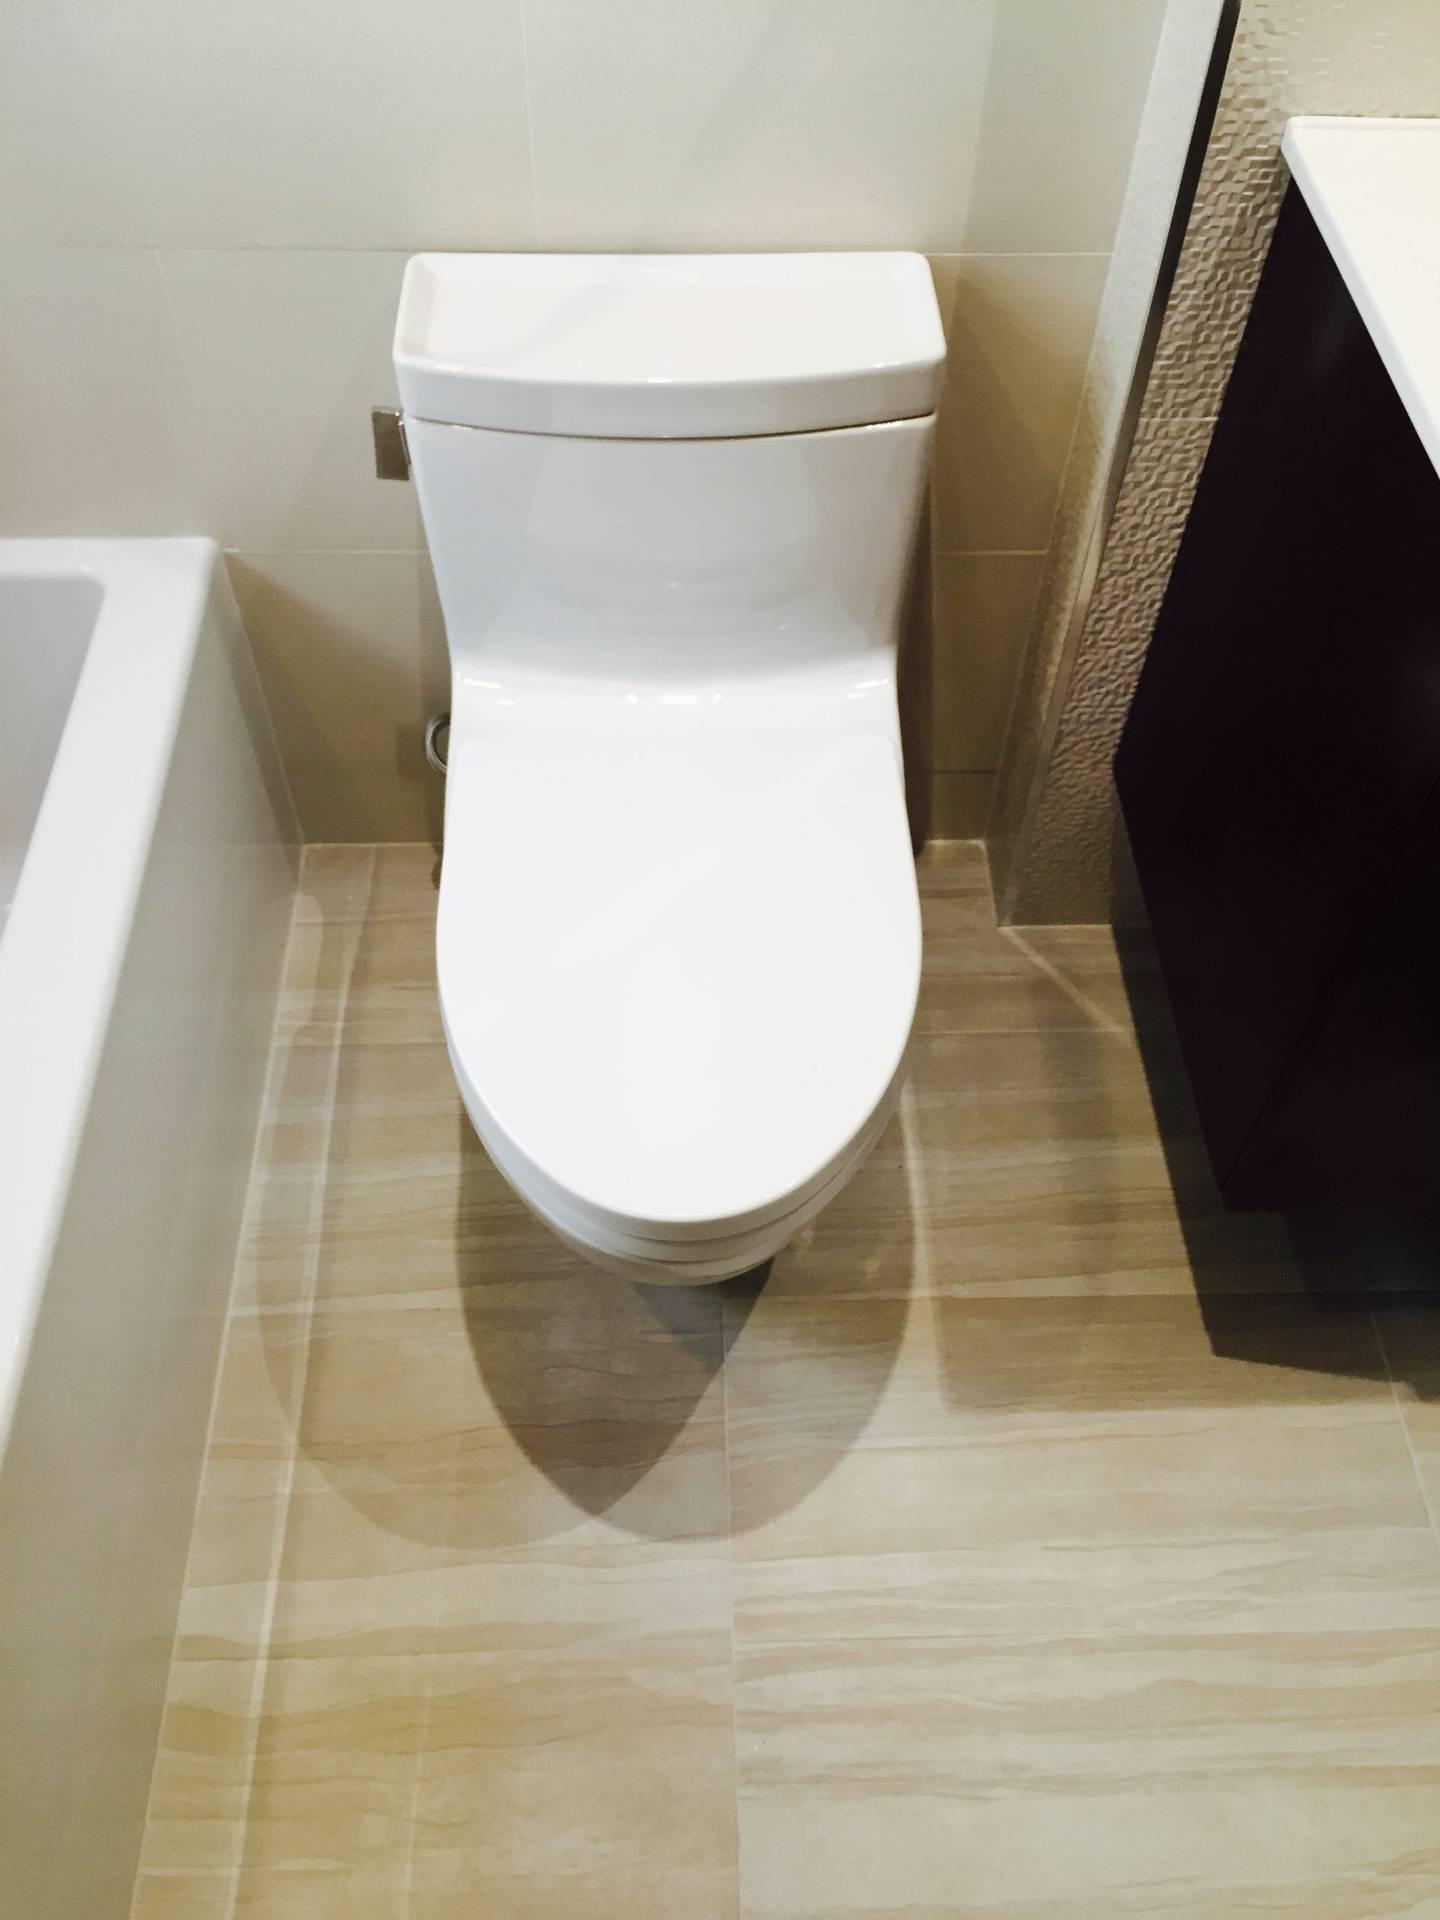 Heated Toilet and Floor